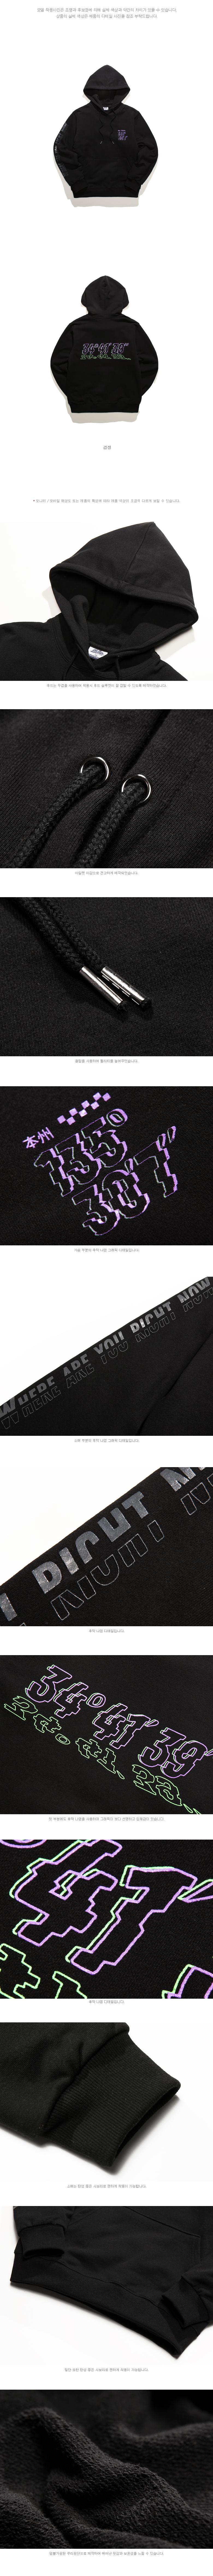 YRHD6122_detail_black.jpg